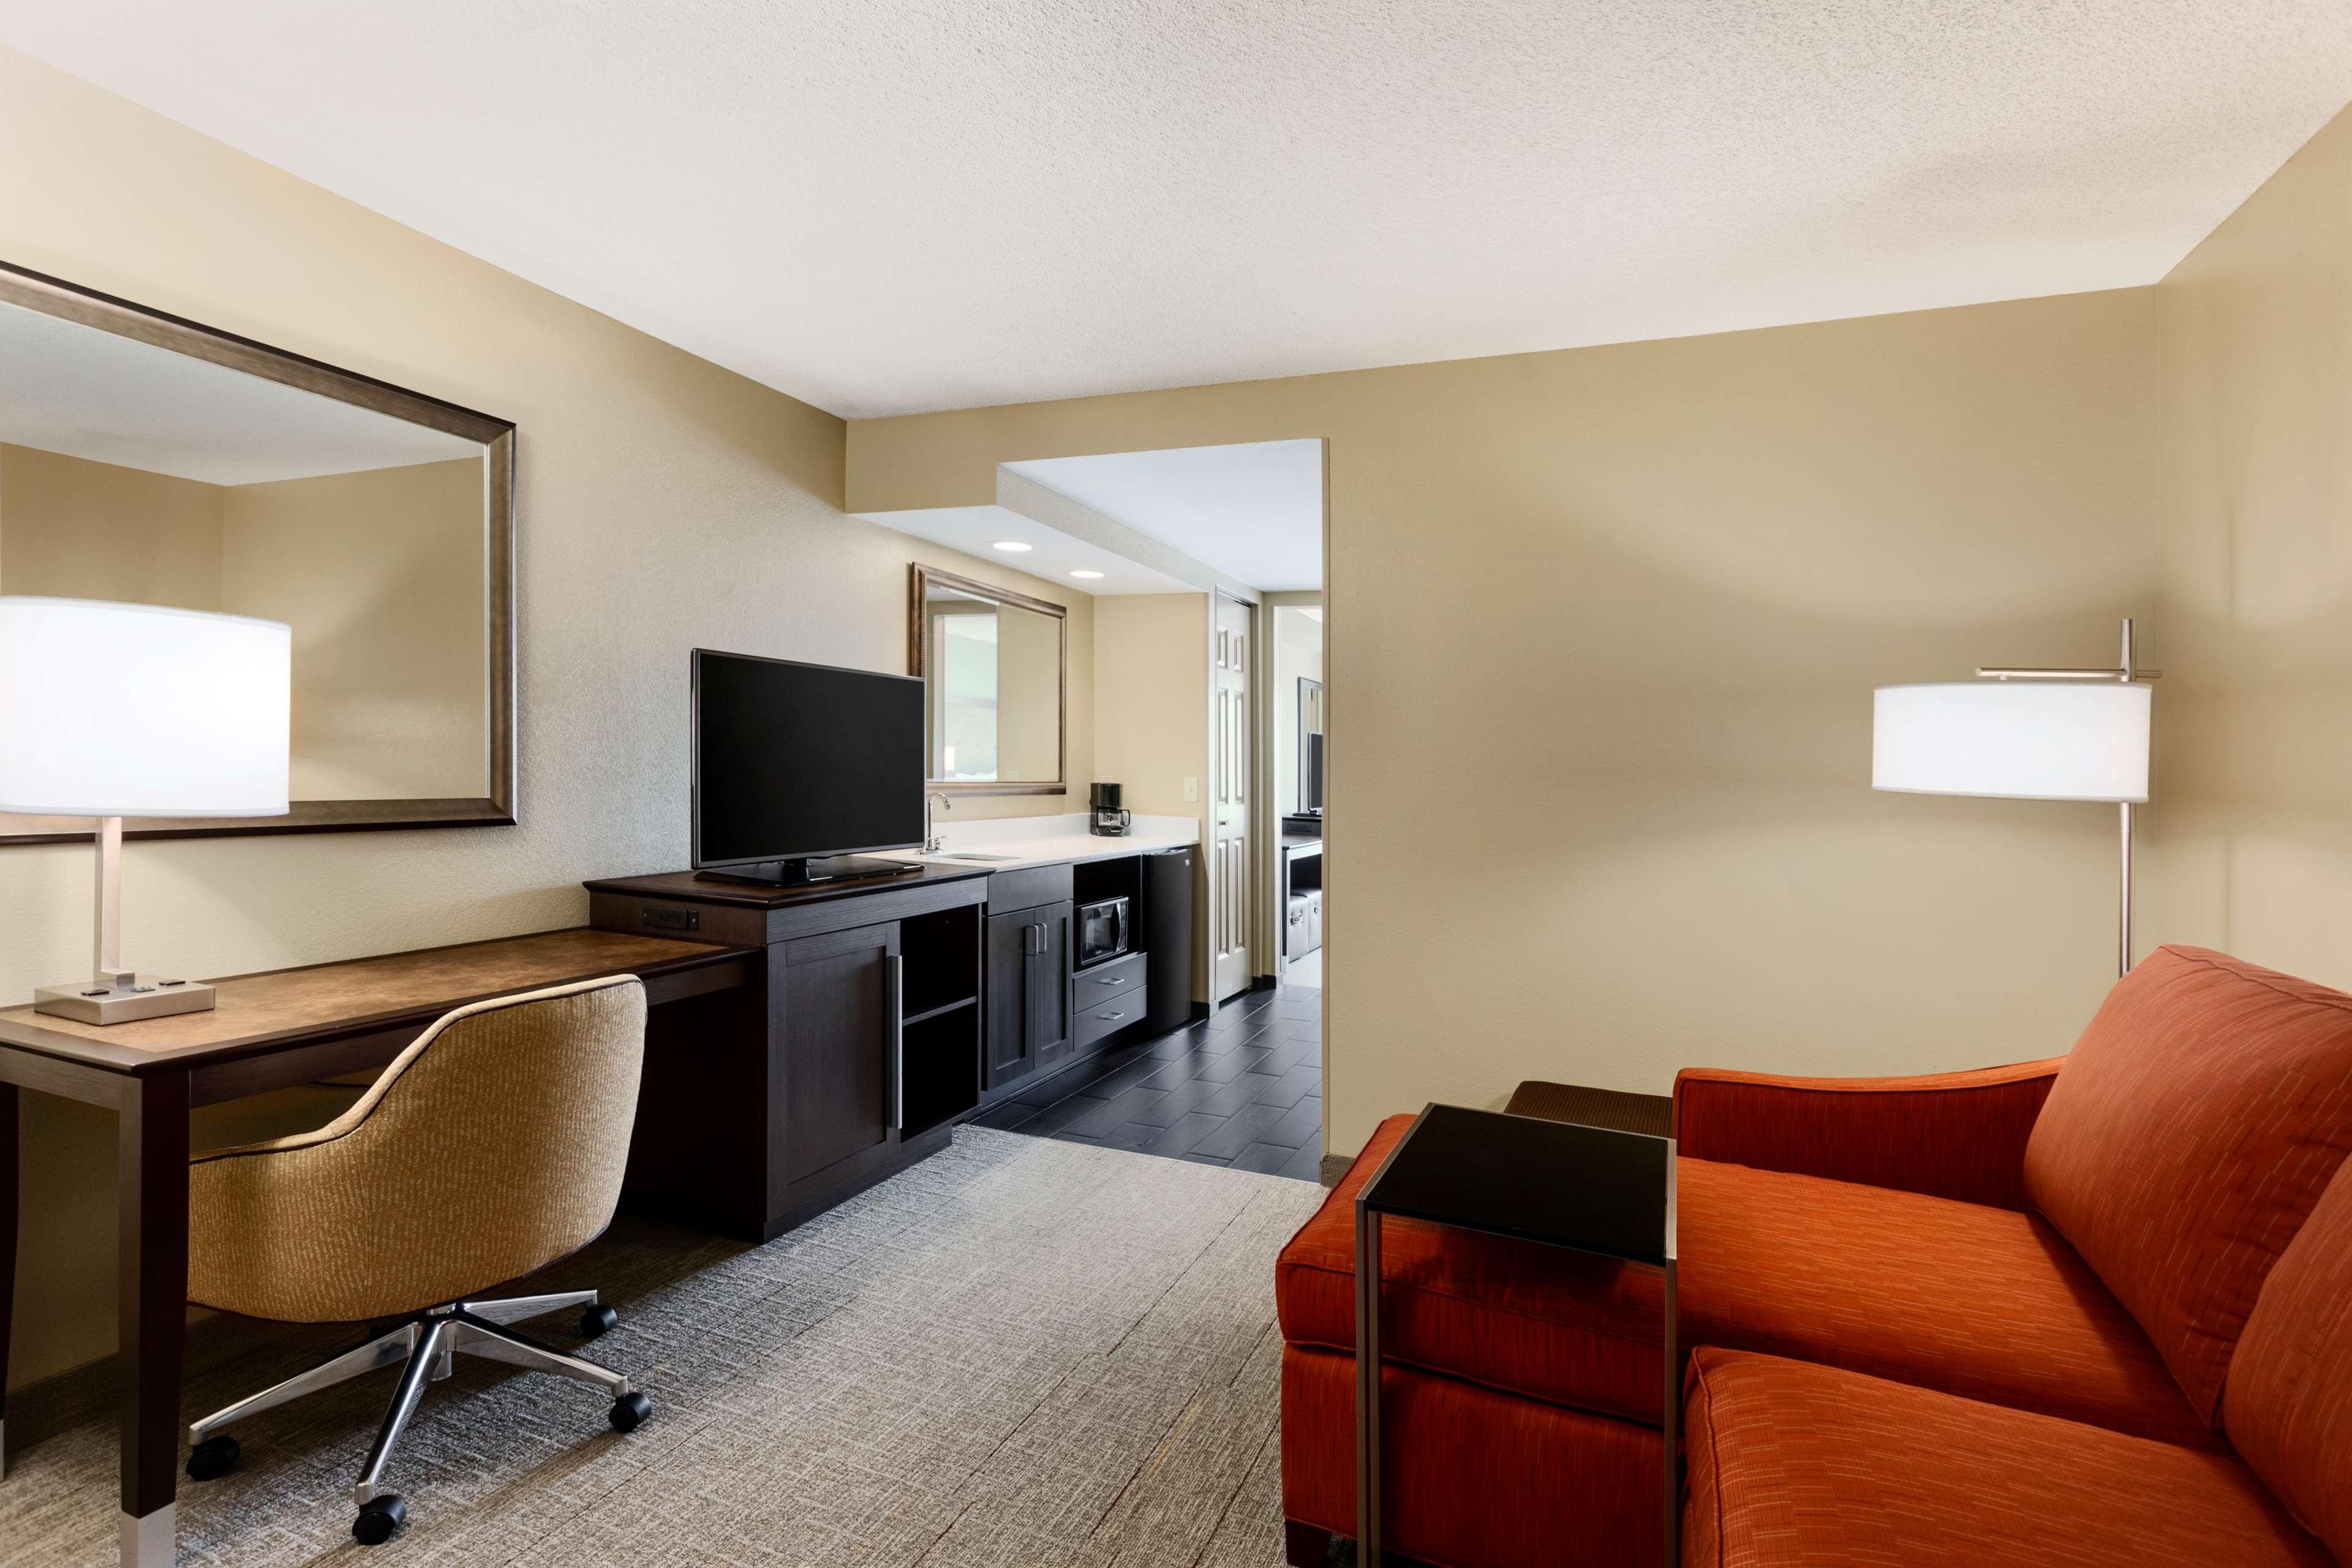 Hampton Inn & Suites Hershey Near The Park image 13